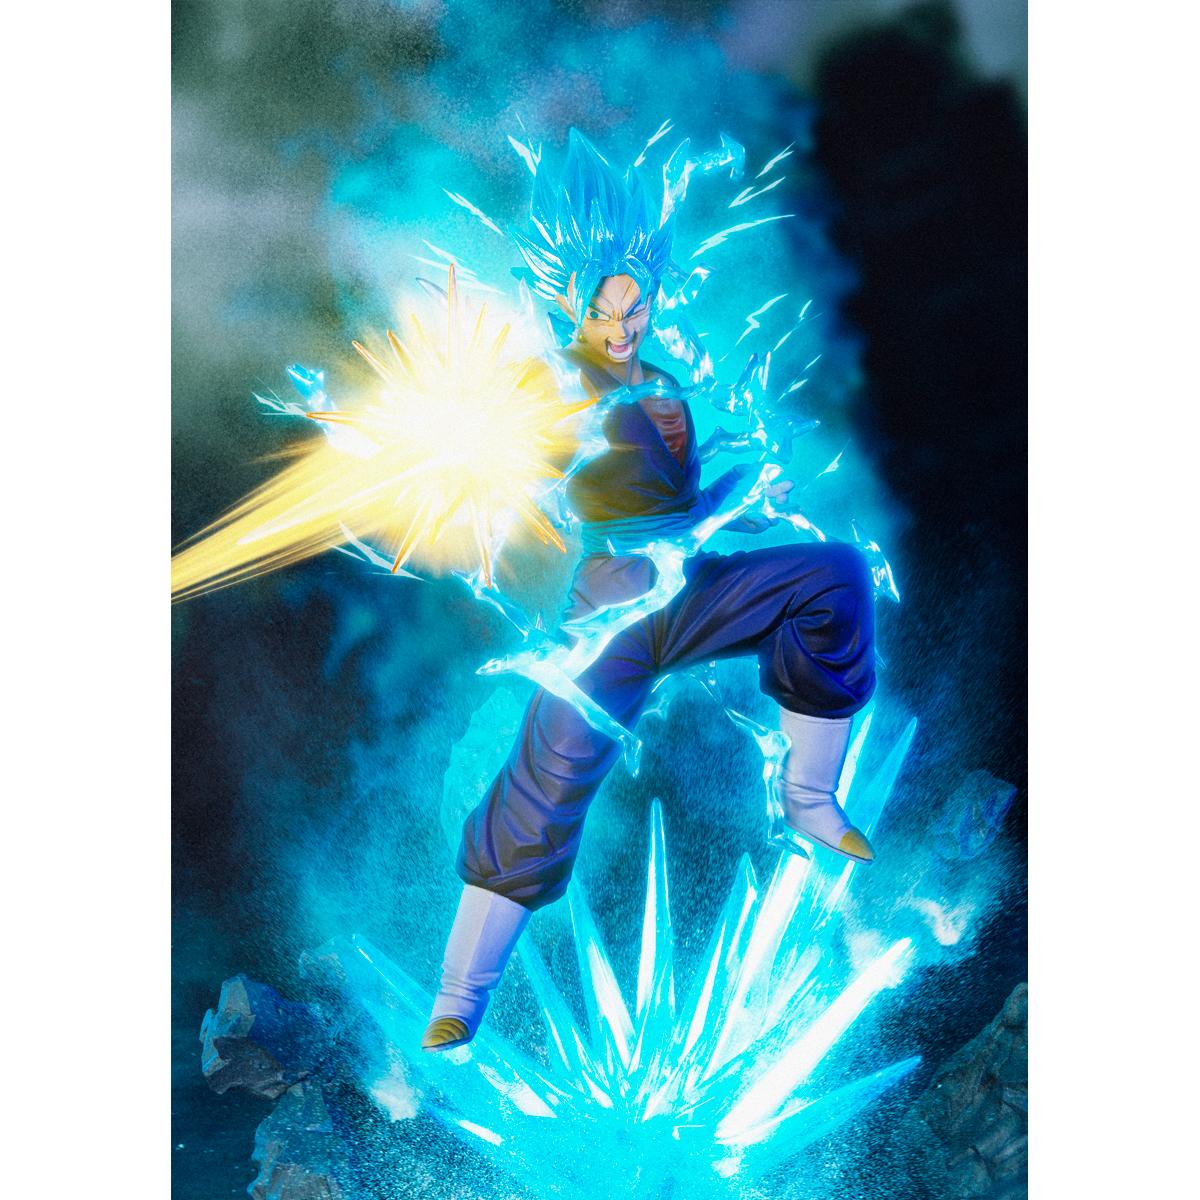 Figuarts ZERO SUPER SAIYAN GOD SUPER SAIYAN VEGITO-Event Exclusive Color Edition-[Sep 2020 Delivery]